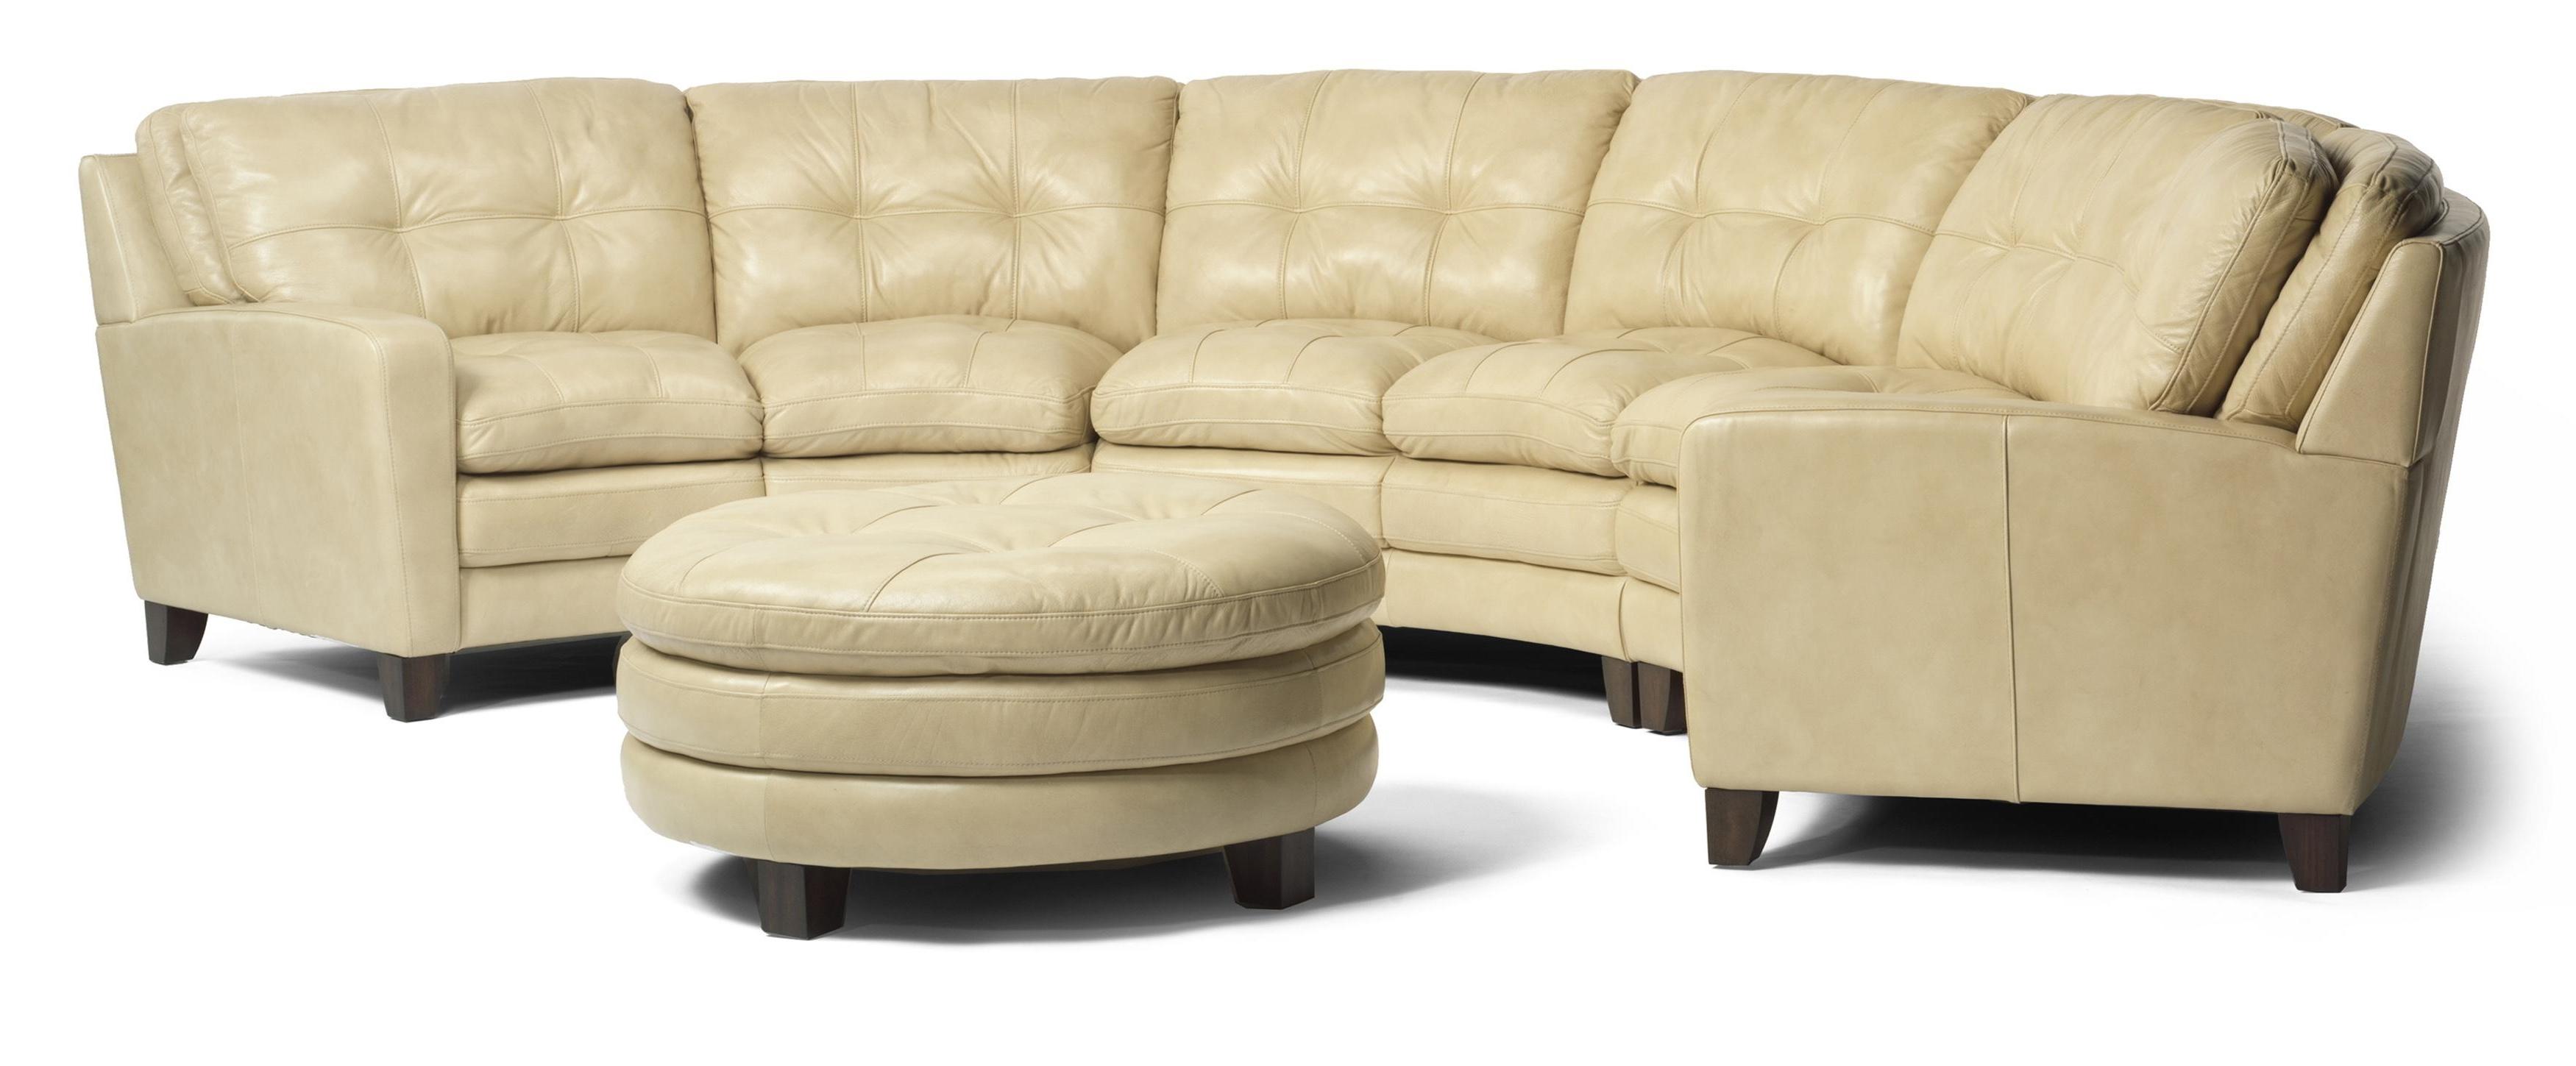 Jonesboro Ar Sectional Sofas with Well known Flexsteel Latitudes - South Street Curved Sectional Sofa - Ahfa